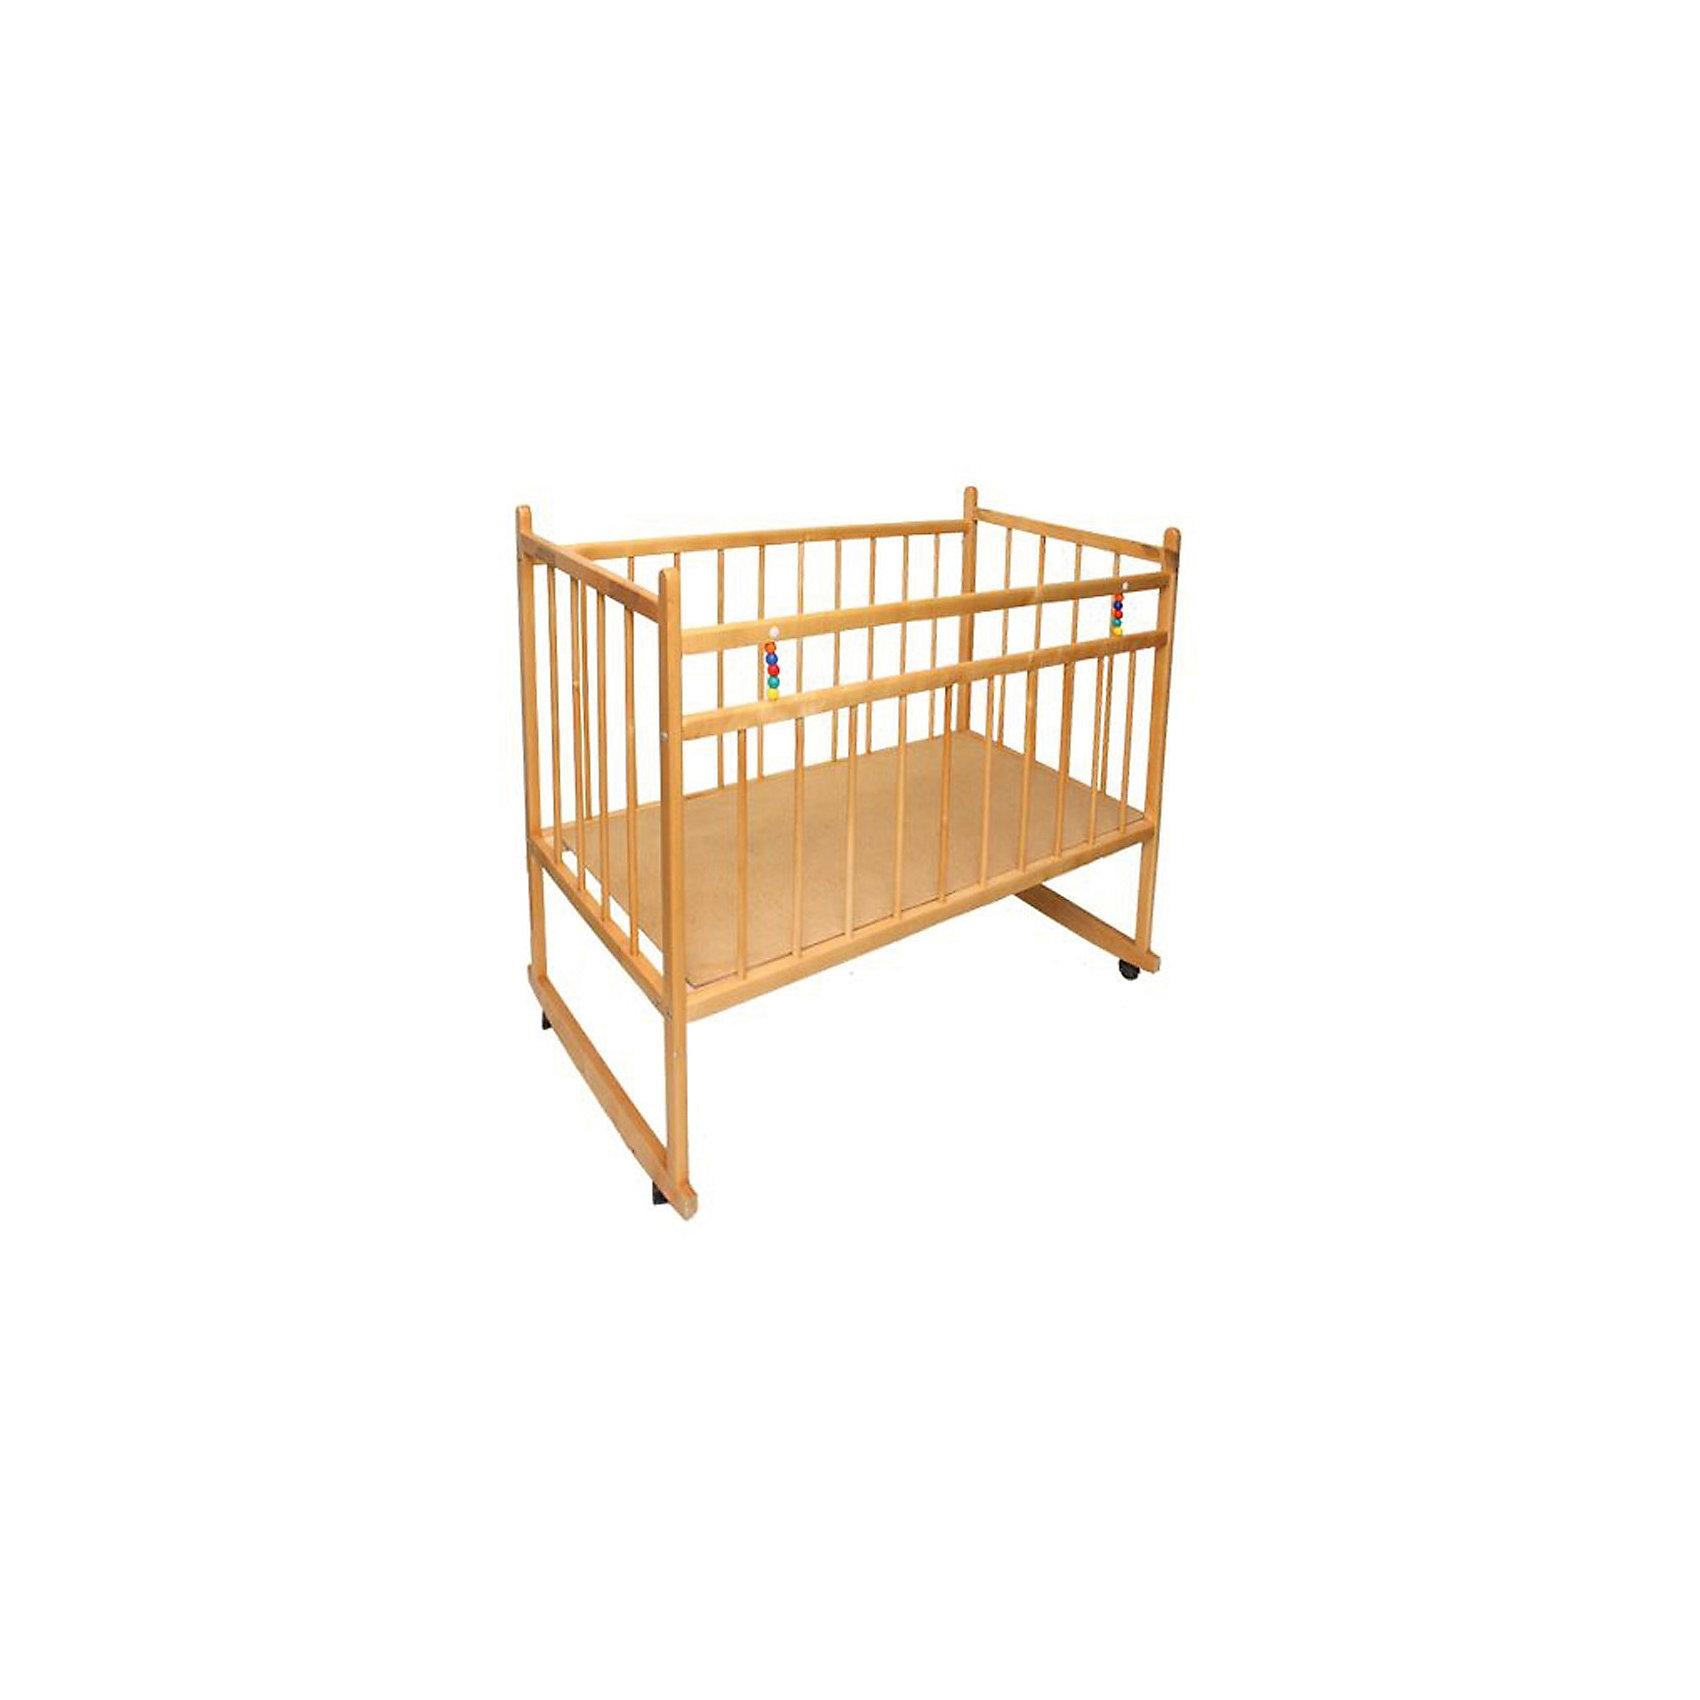 Кроватка-качалка Мишутка 13, светлая